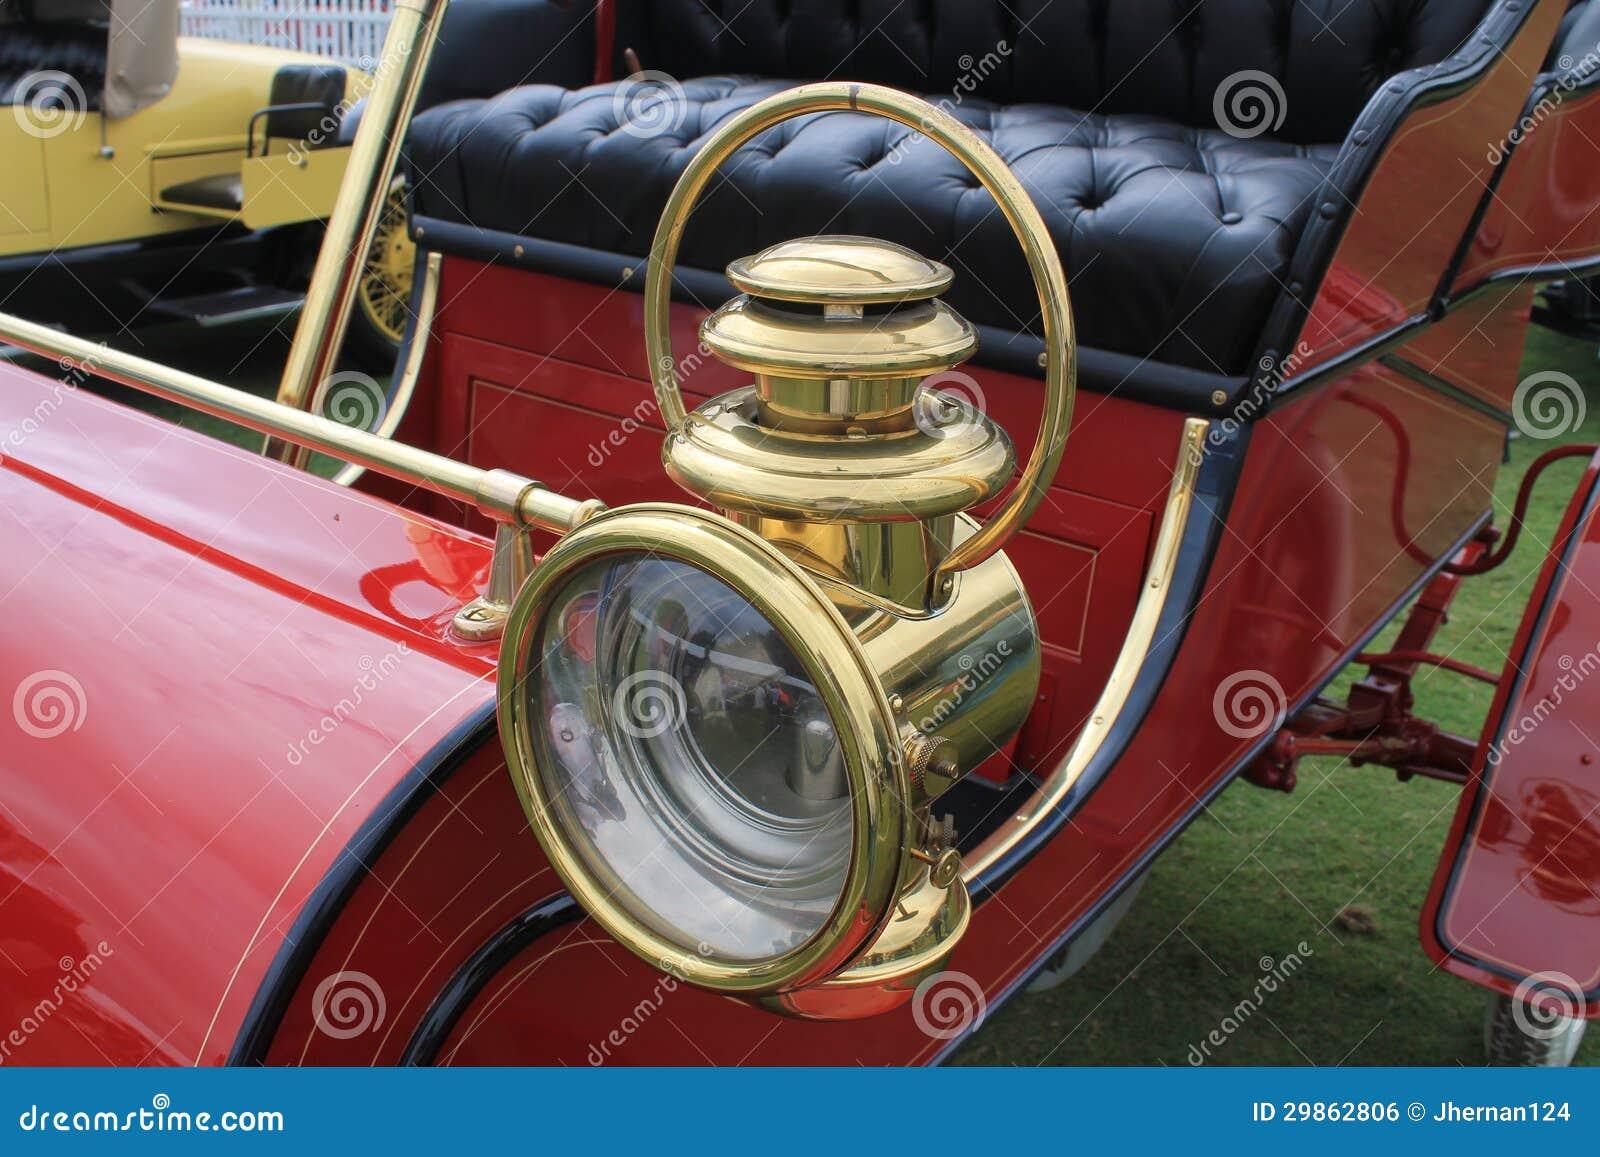 Antique Automobile Headlamps : S classic american car vintage headlamp royalty free